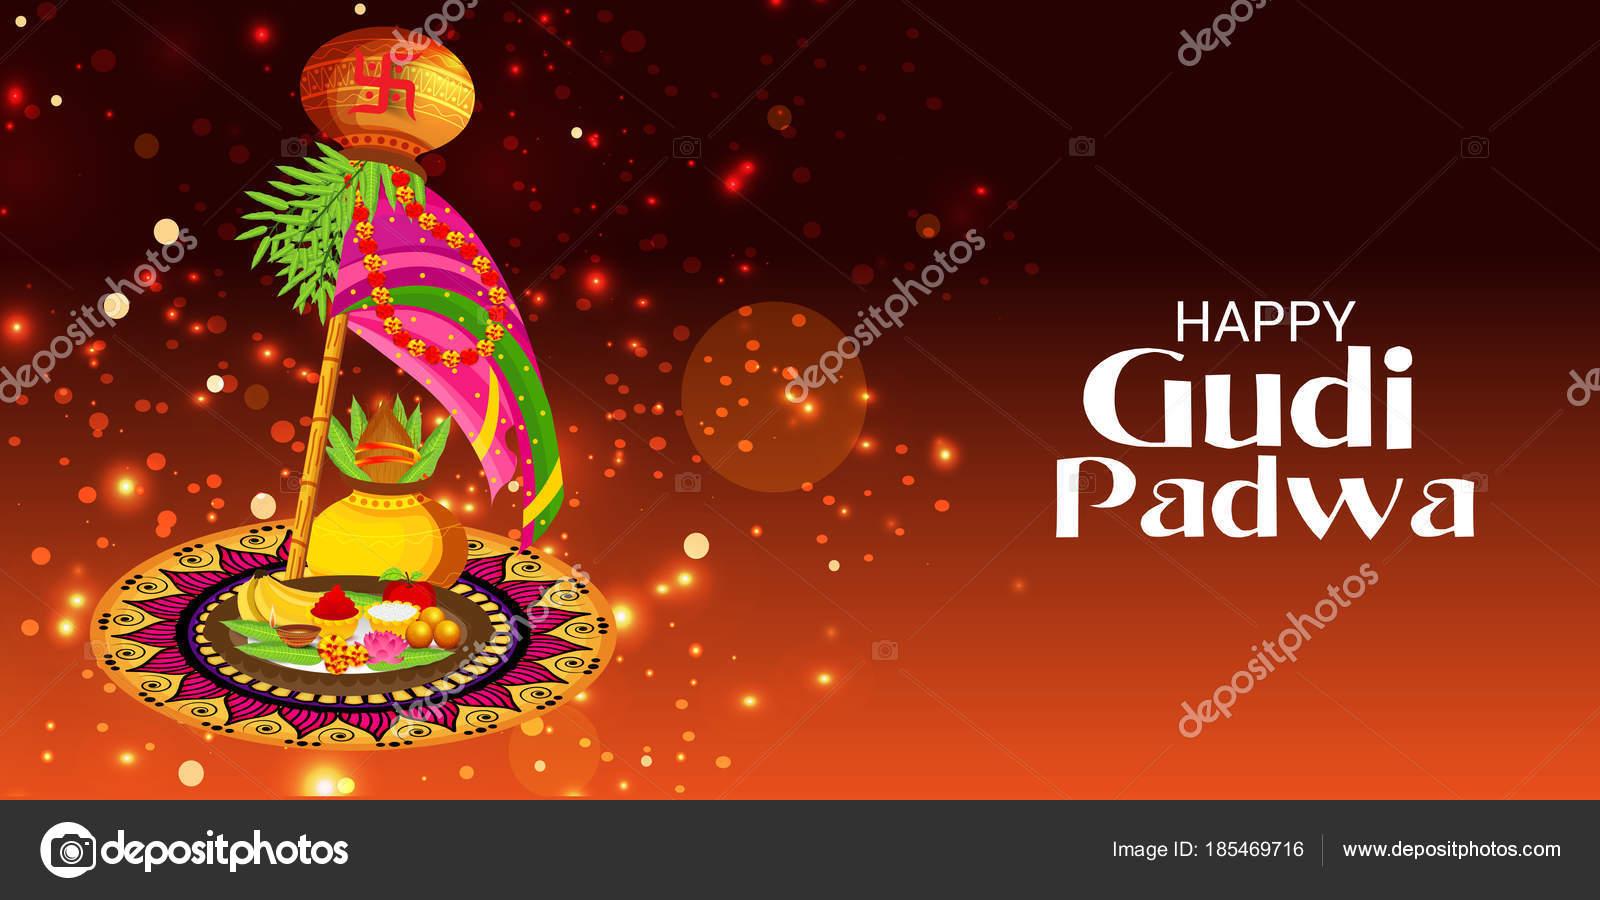 Illustration background happy gudi padwa marathi new year stock illustration background happy gudi padwa marathi new year stock vector m4hsunfo